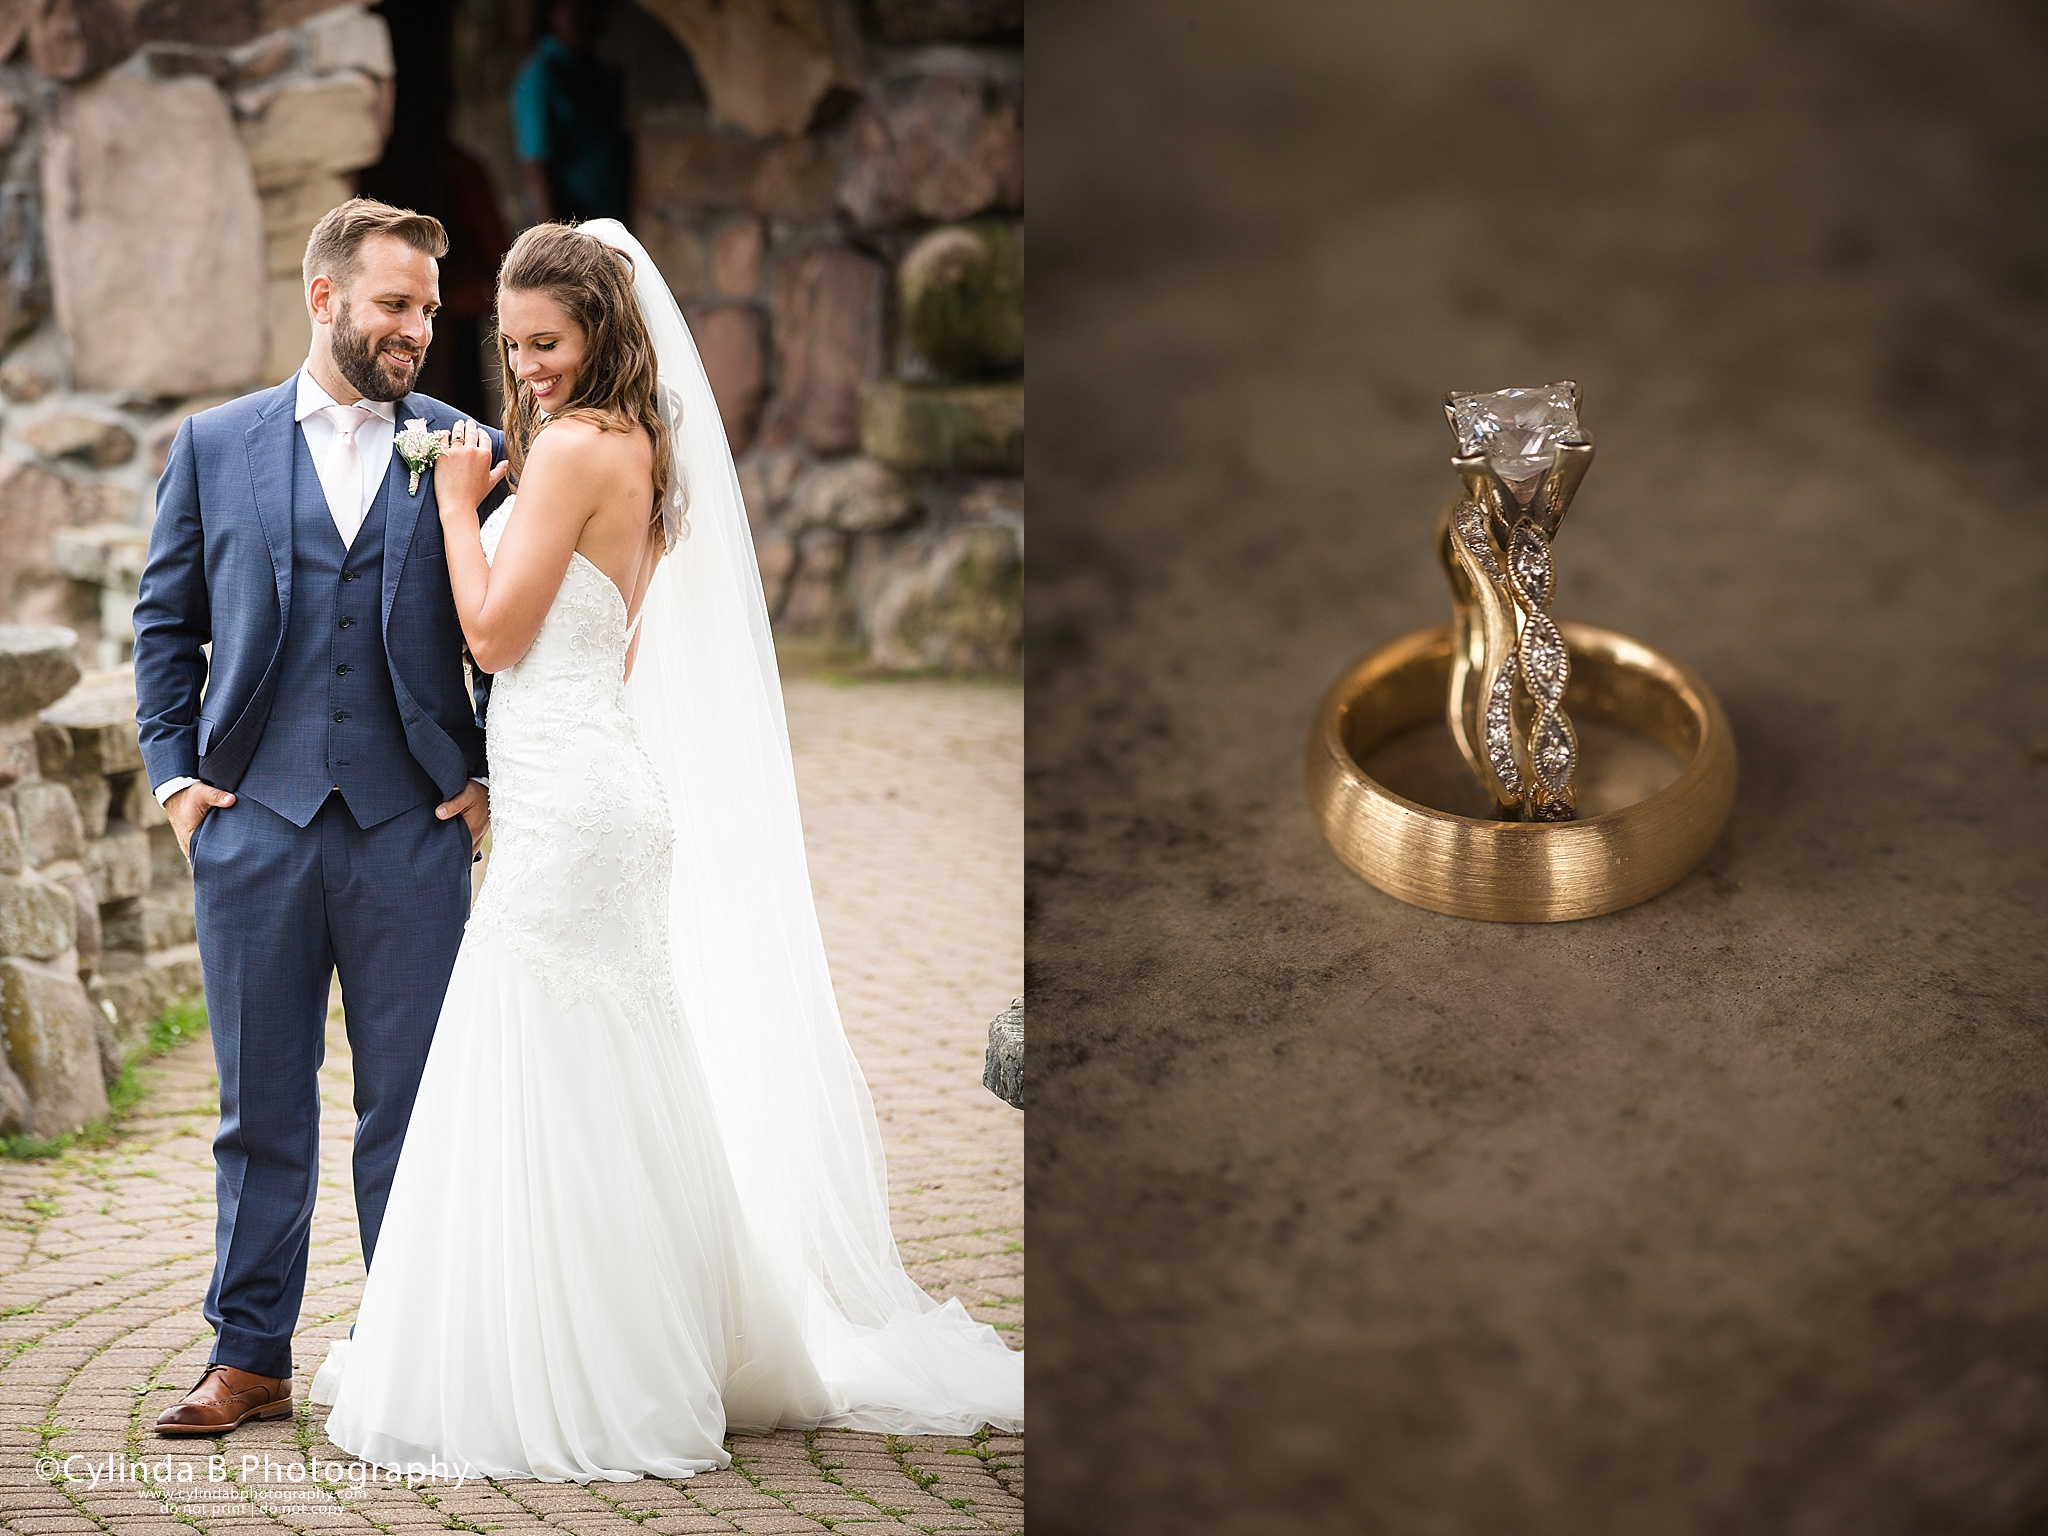 Boldt Castle Wedding, Alexandria Bay, Wedding, Photograper, Cylinda B Photography-32